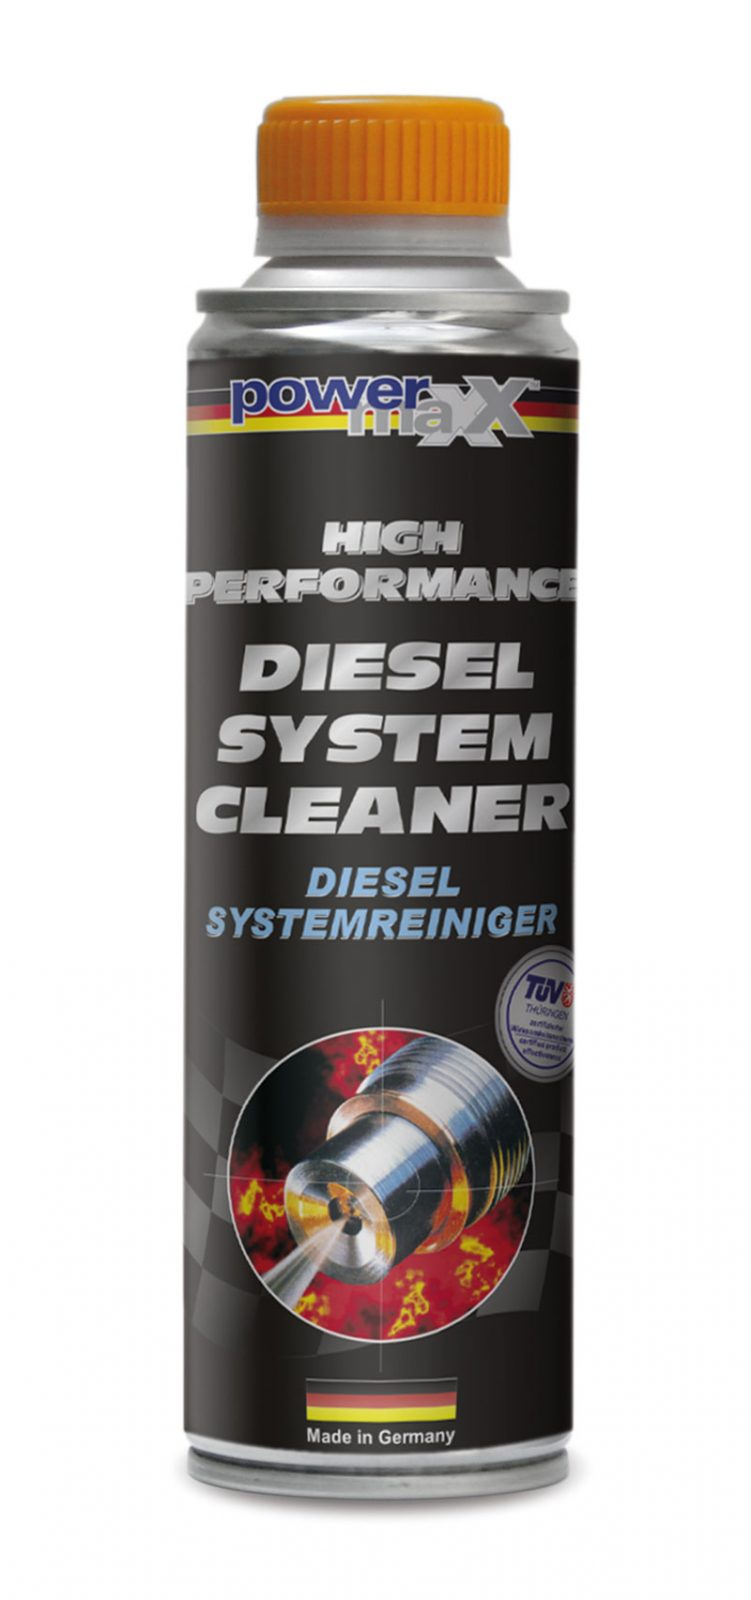 Diesel-System-Cleaner